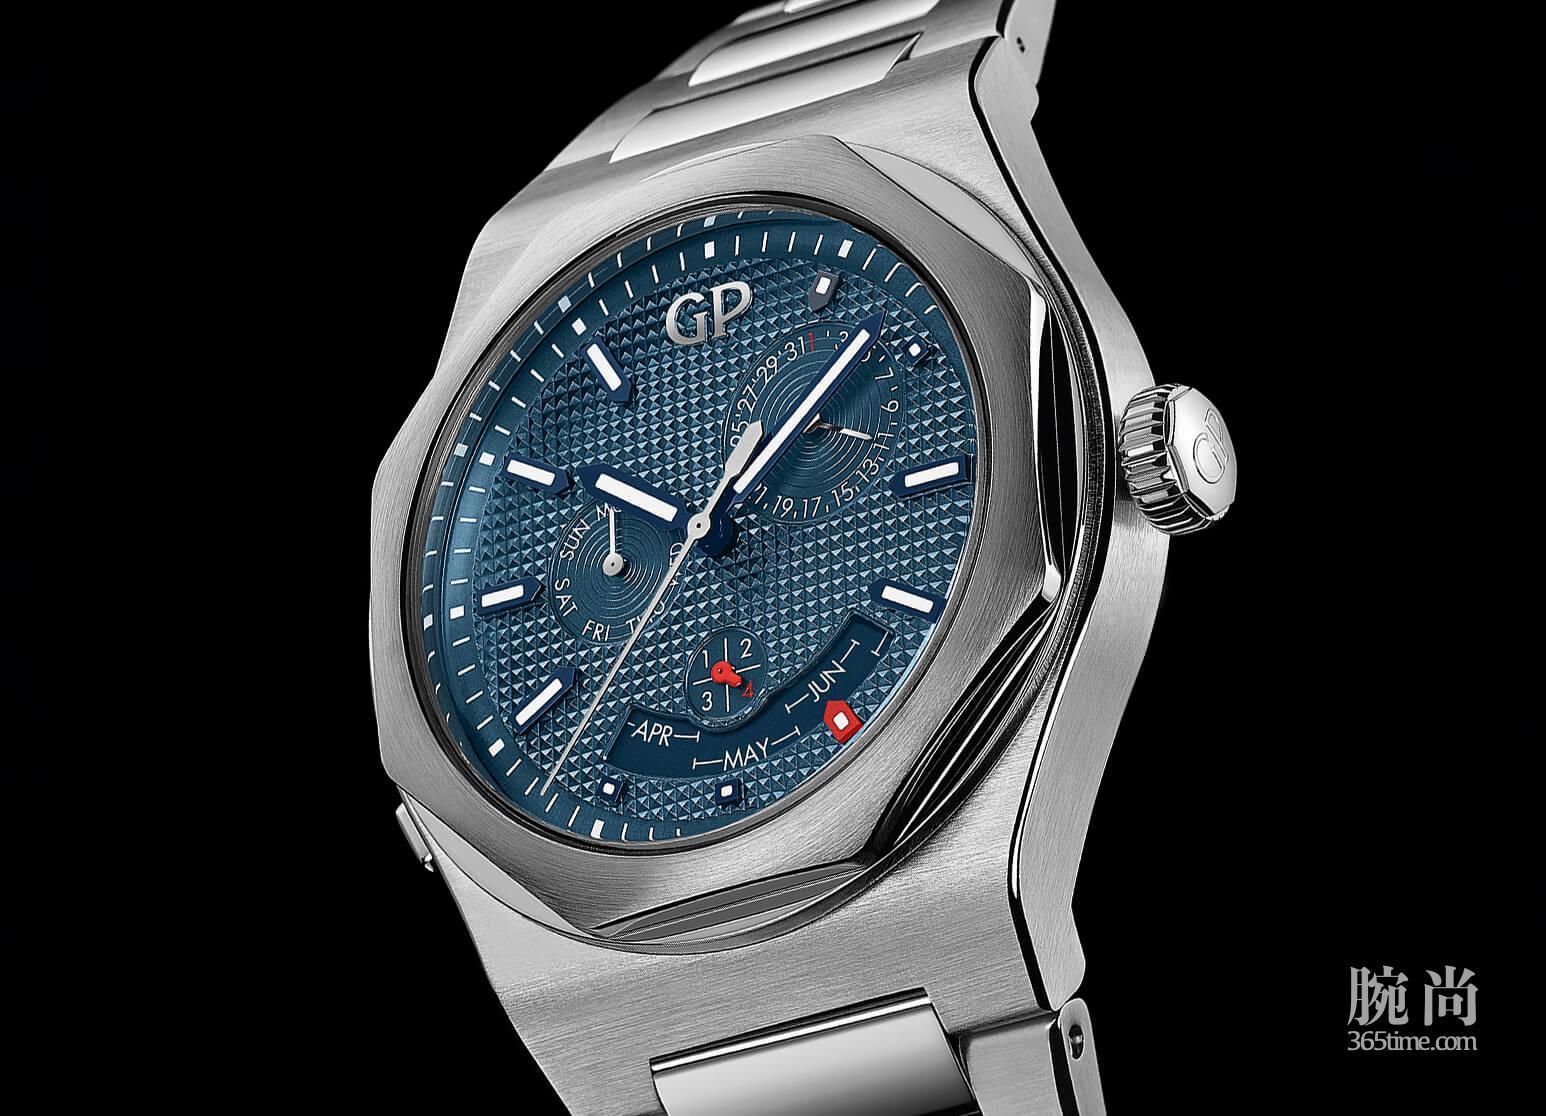 Girard-Perregaux-Laureato-Perpetual-Calendar-Watch-2.jpg